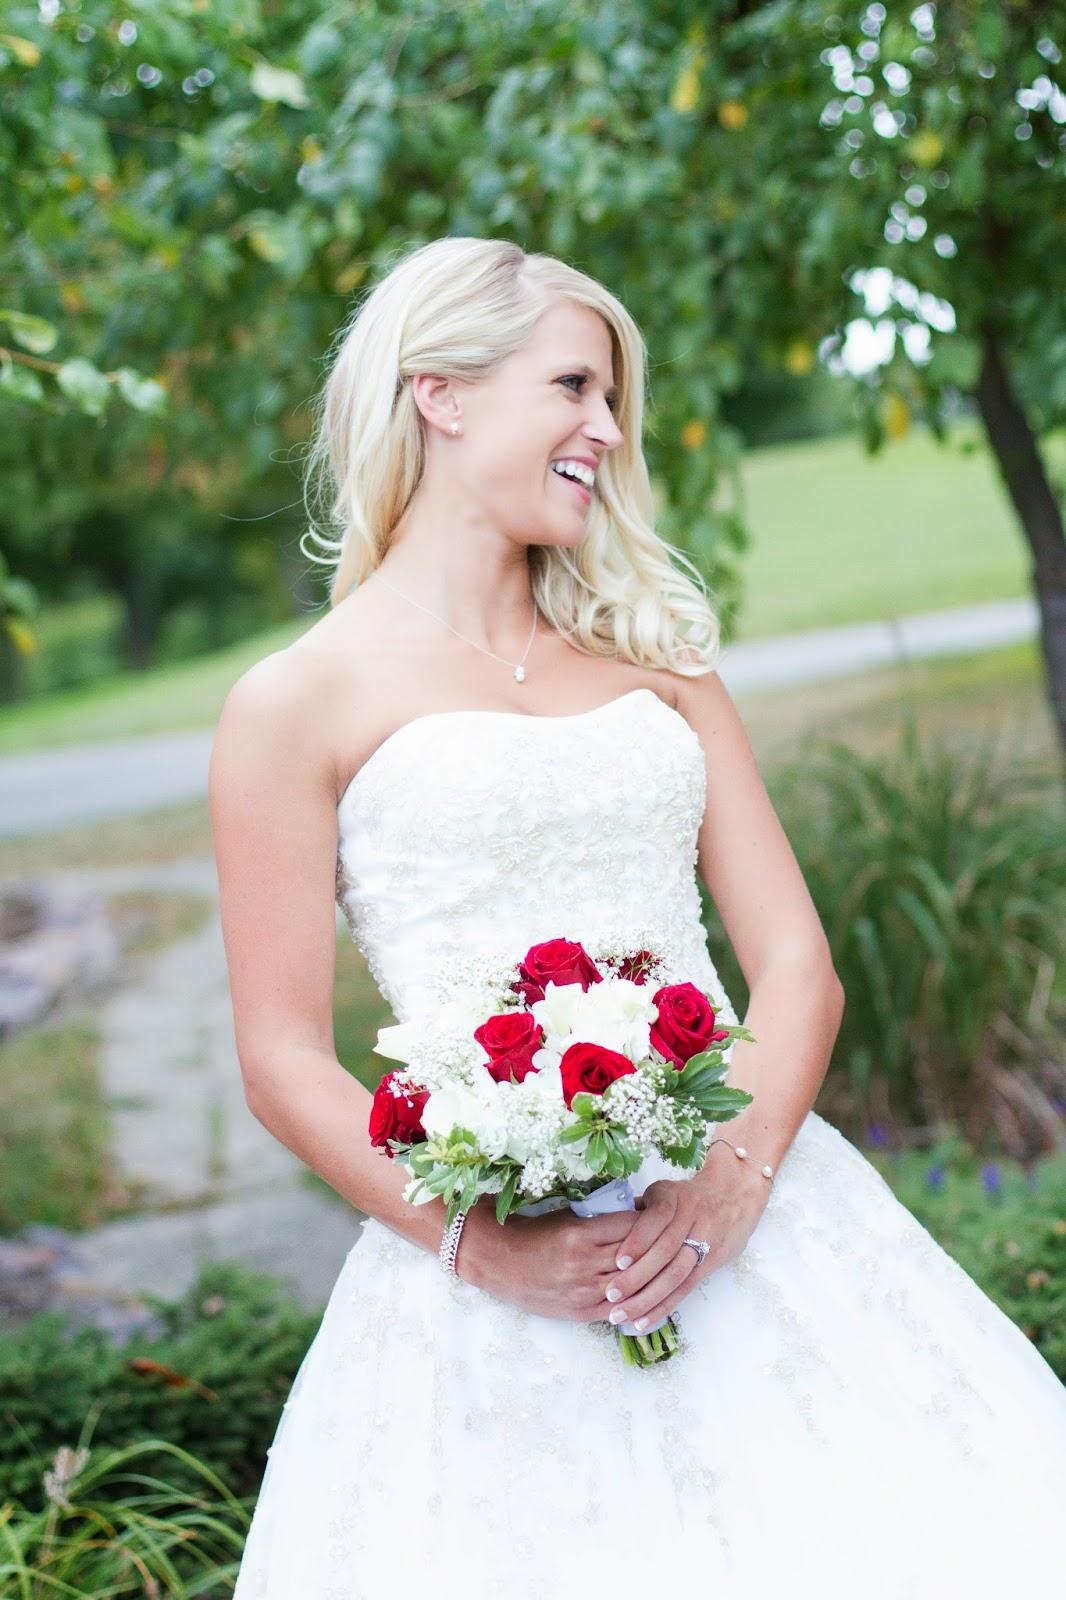 Nicholas Angell wife